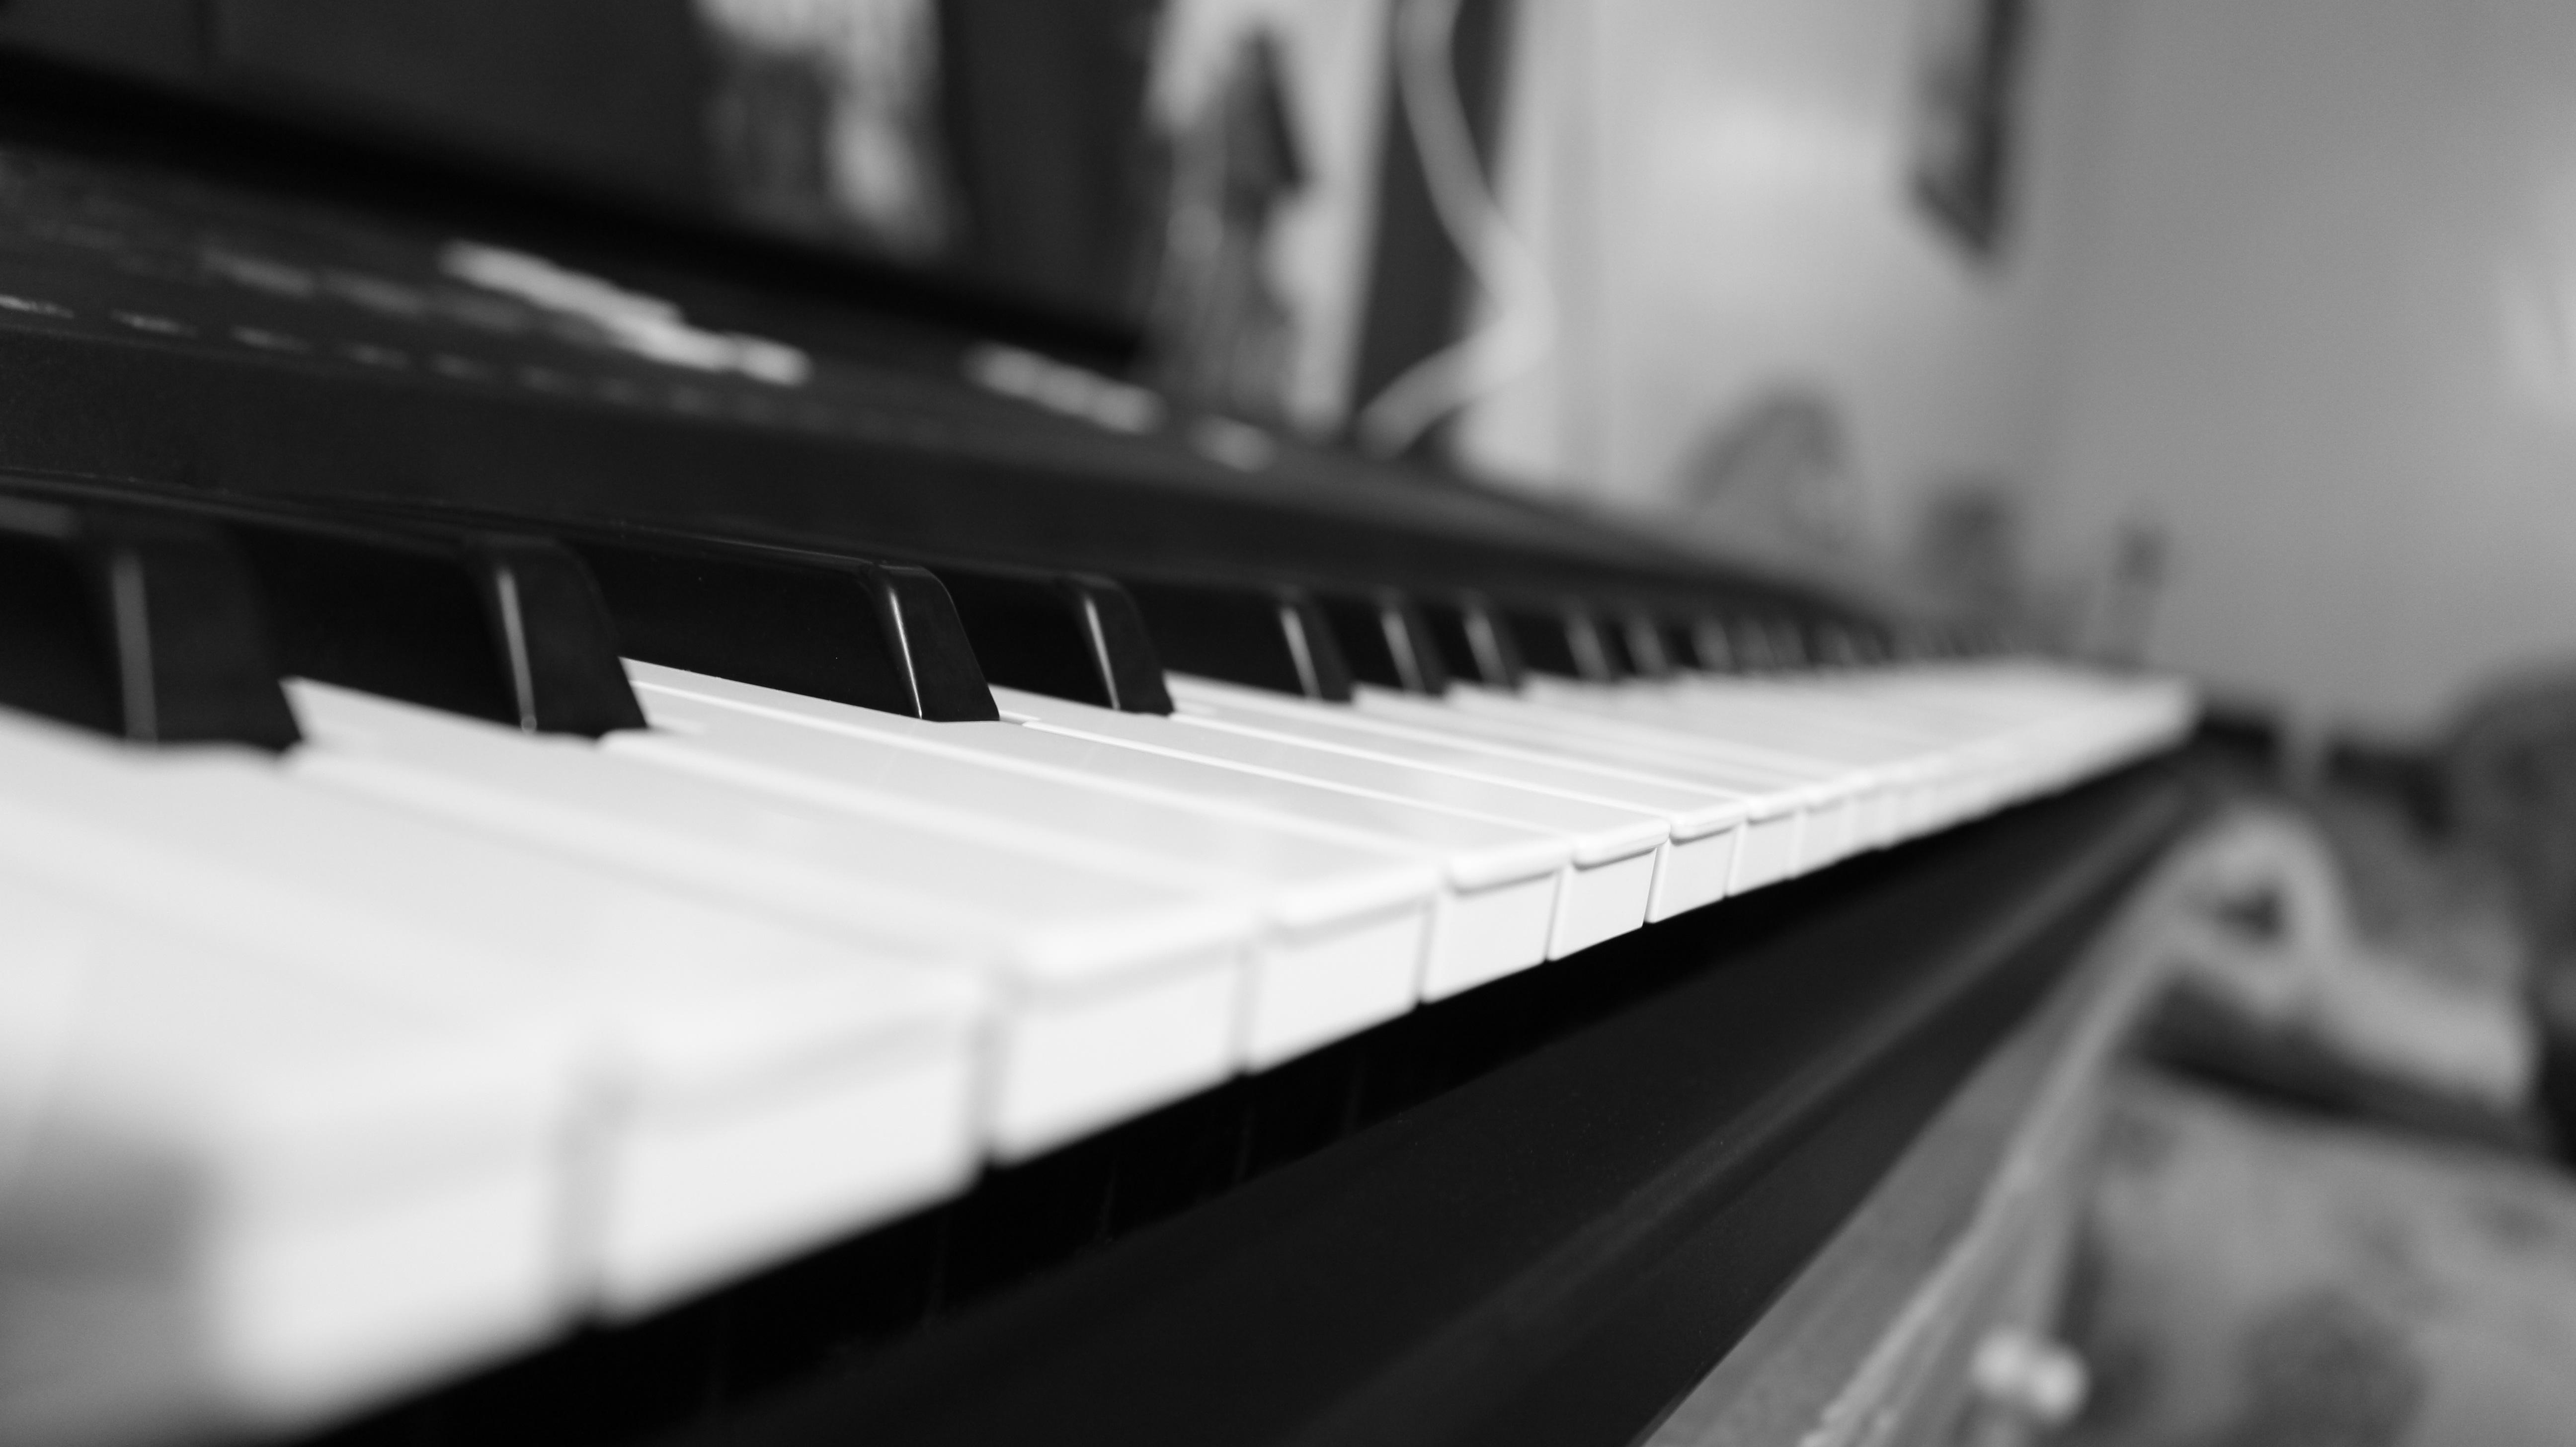 Free stock photo of black-and-white, music, piano, keyboard